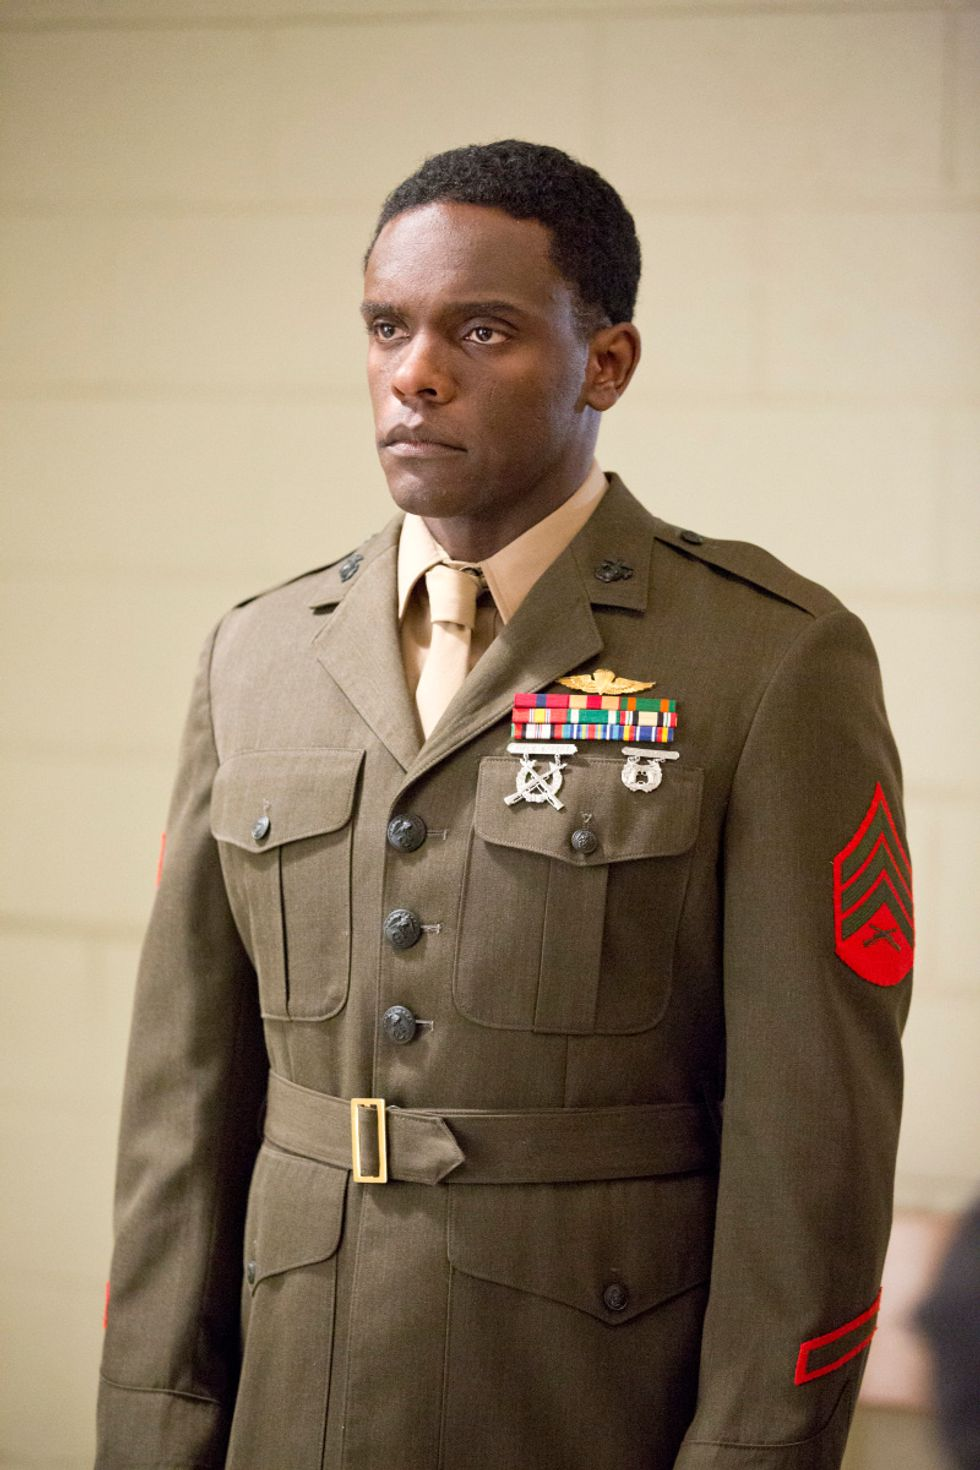 Chris Chalk in military uniform.